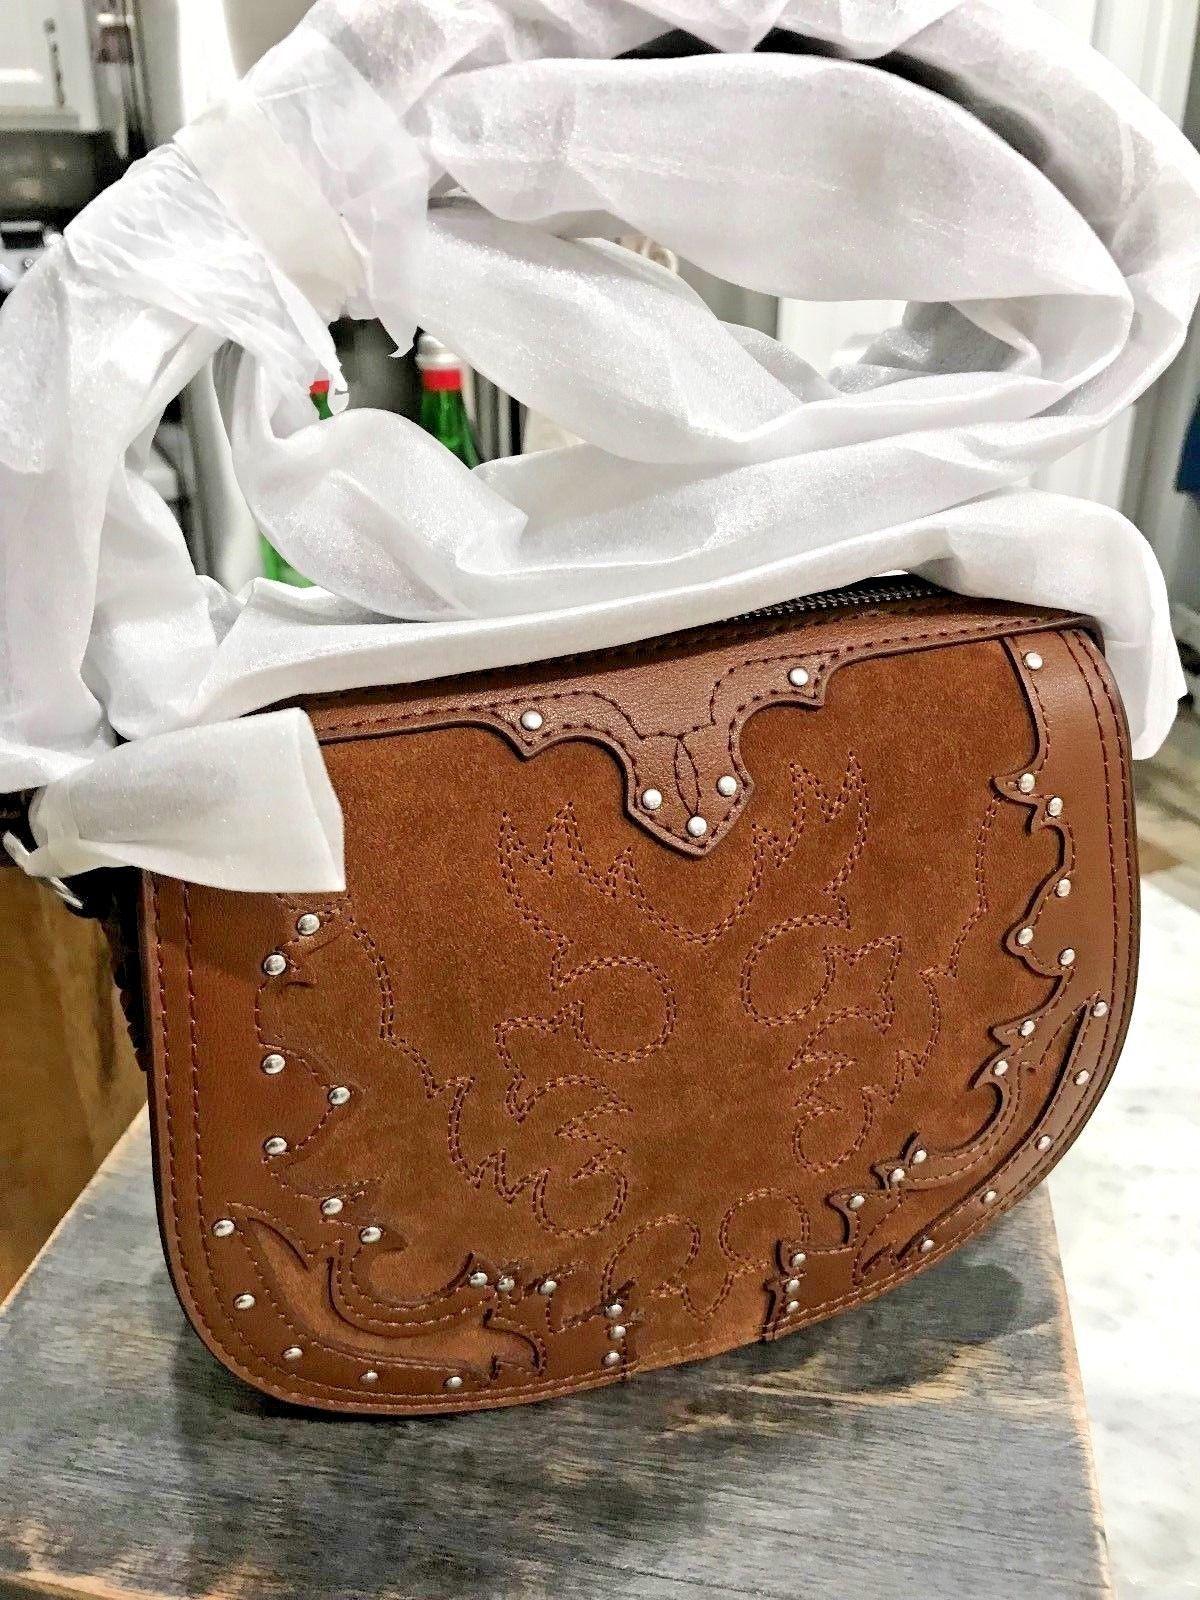 2decf24122dd Polo Ralph Lauren Western Suede Italian Leather Crossbody Bag in Brown Msrp  248